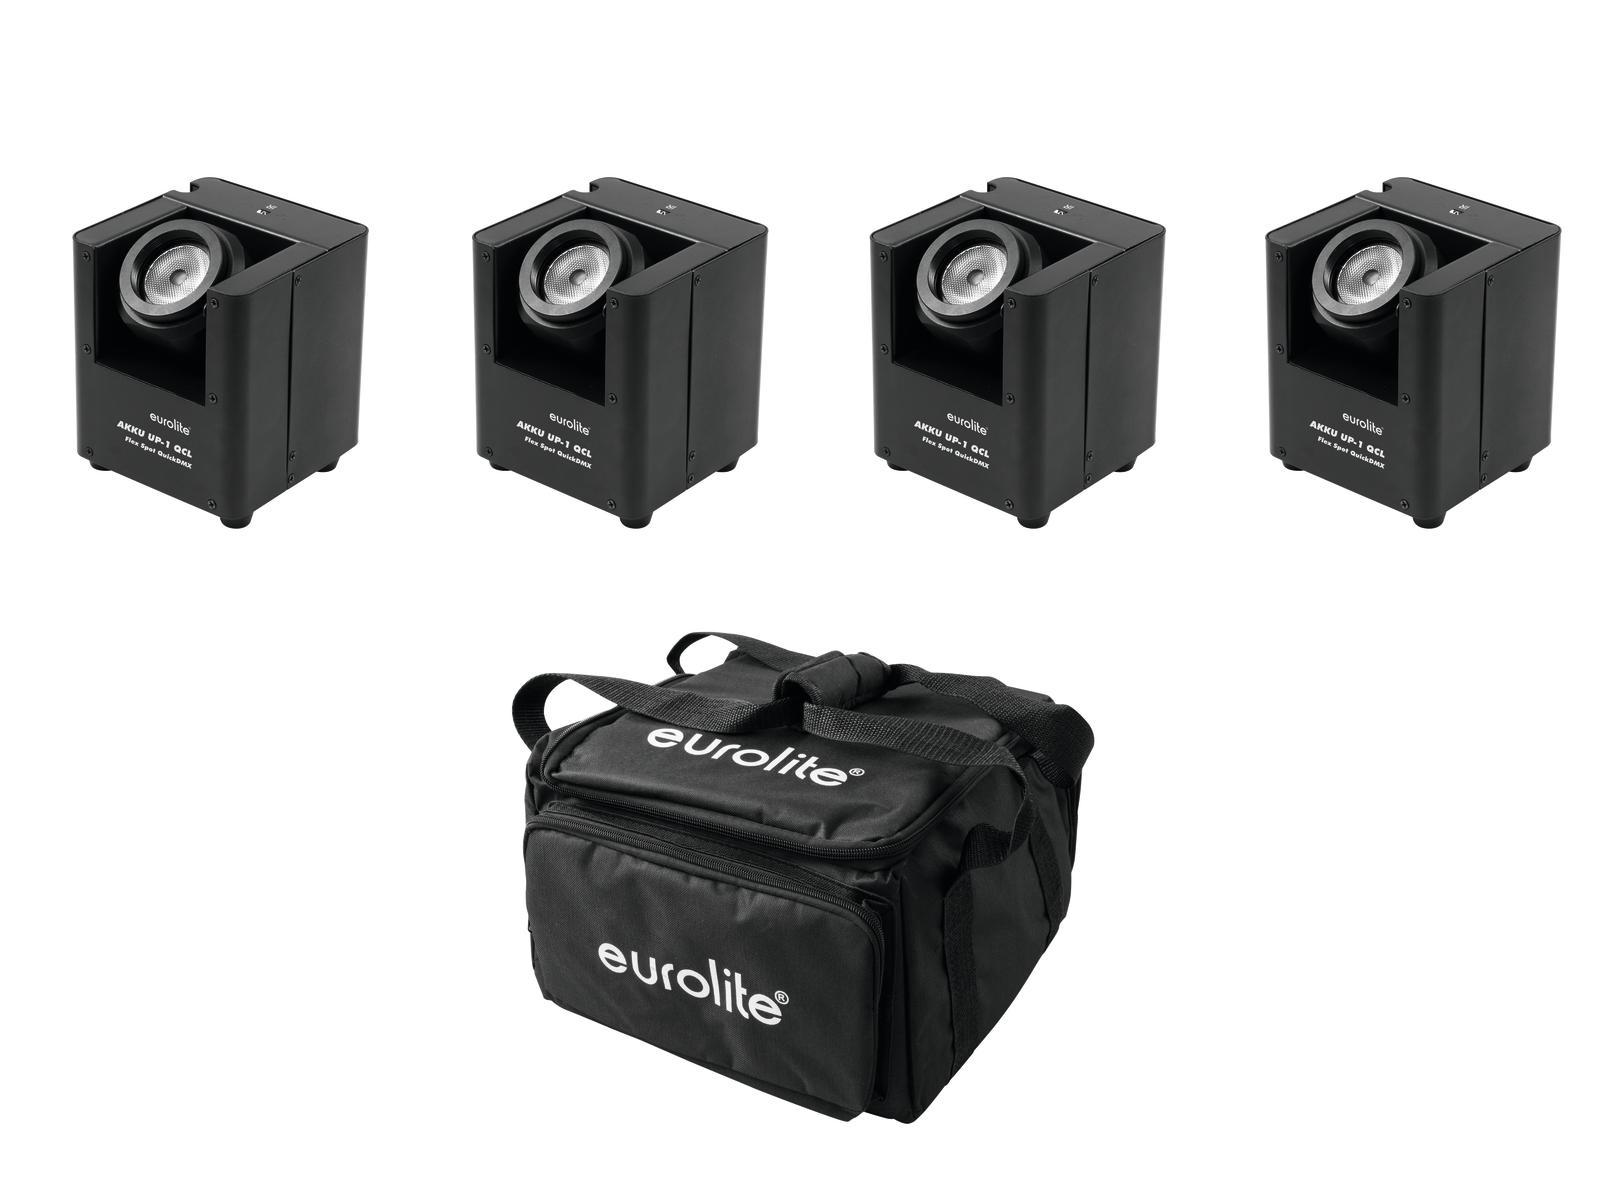 EUROLITE Set 4x AKKU UP-1 + SB-4 Soft-Bag